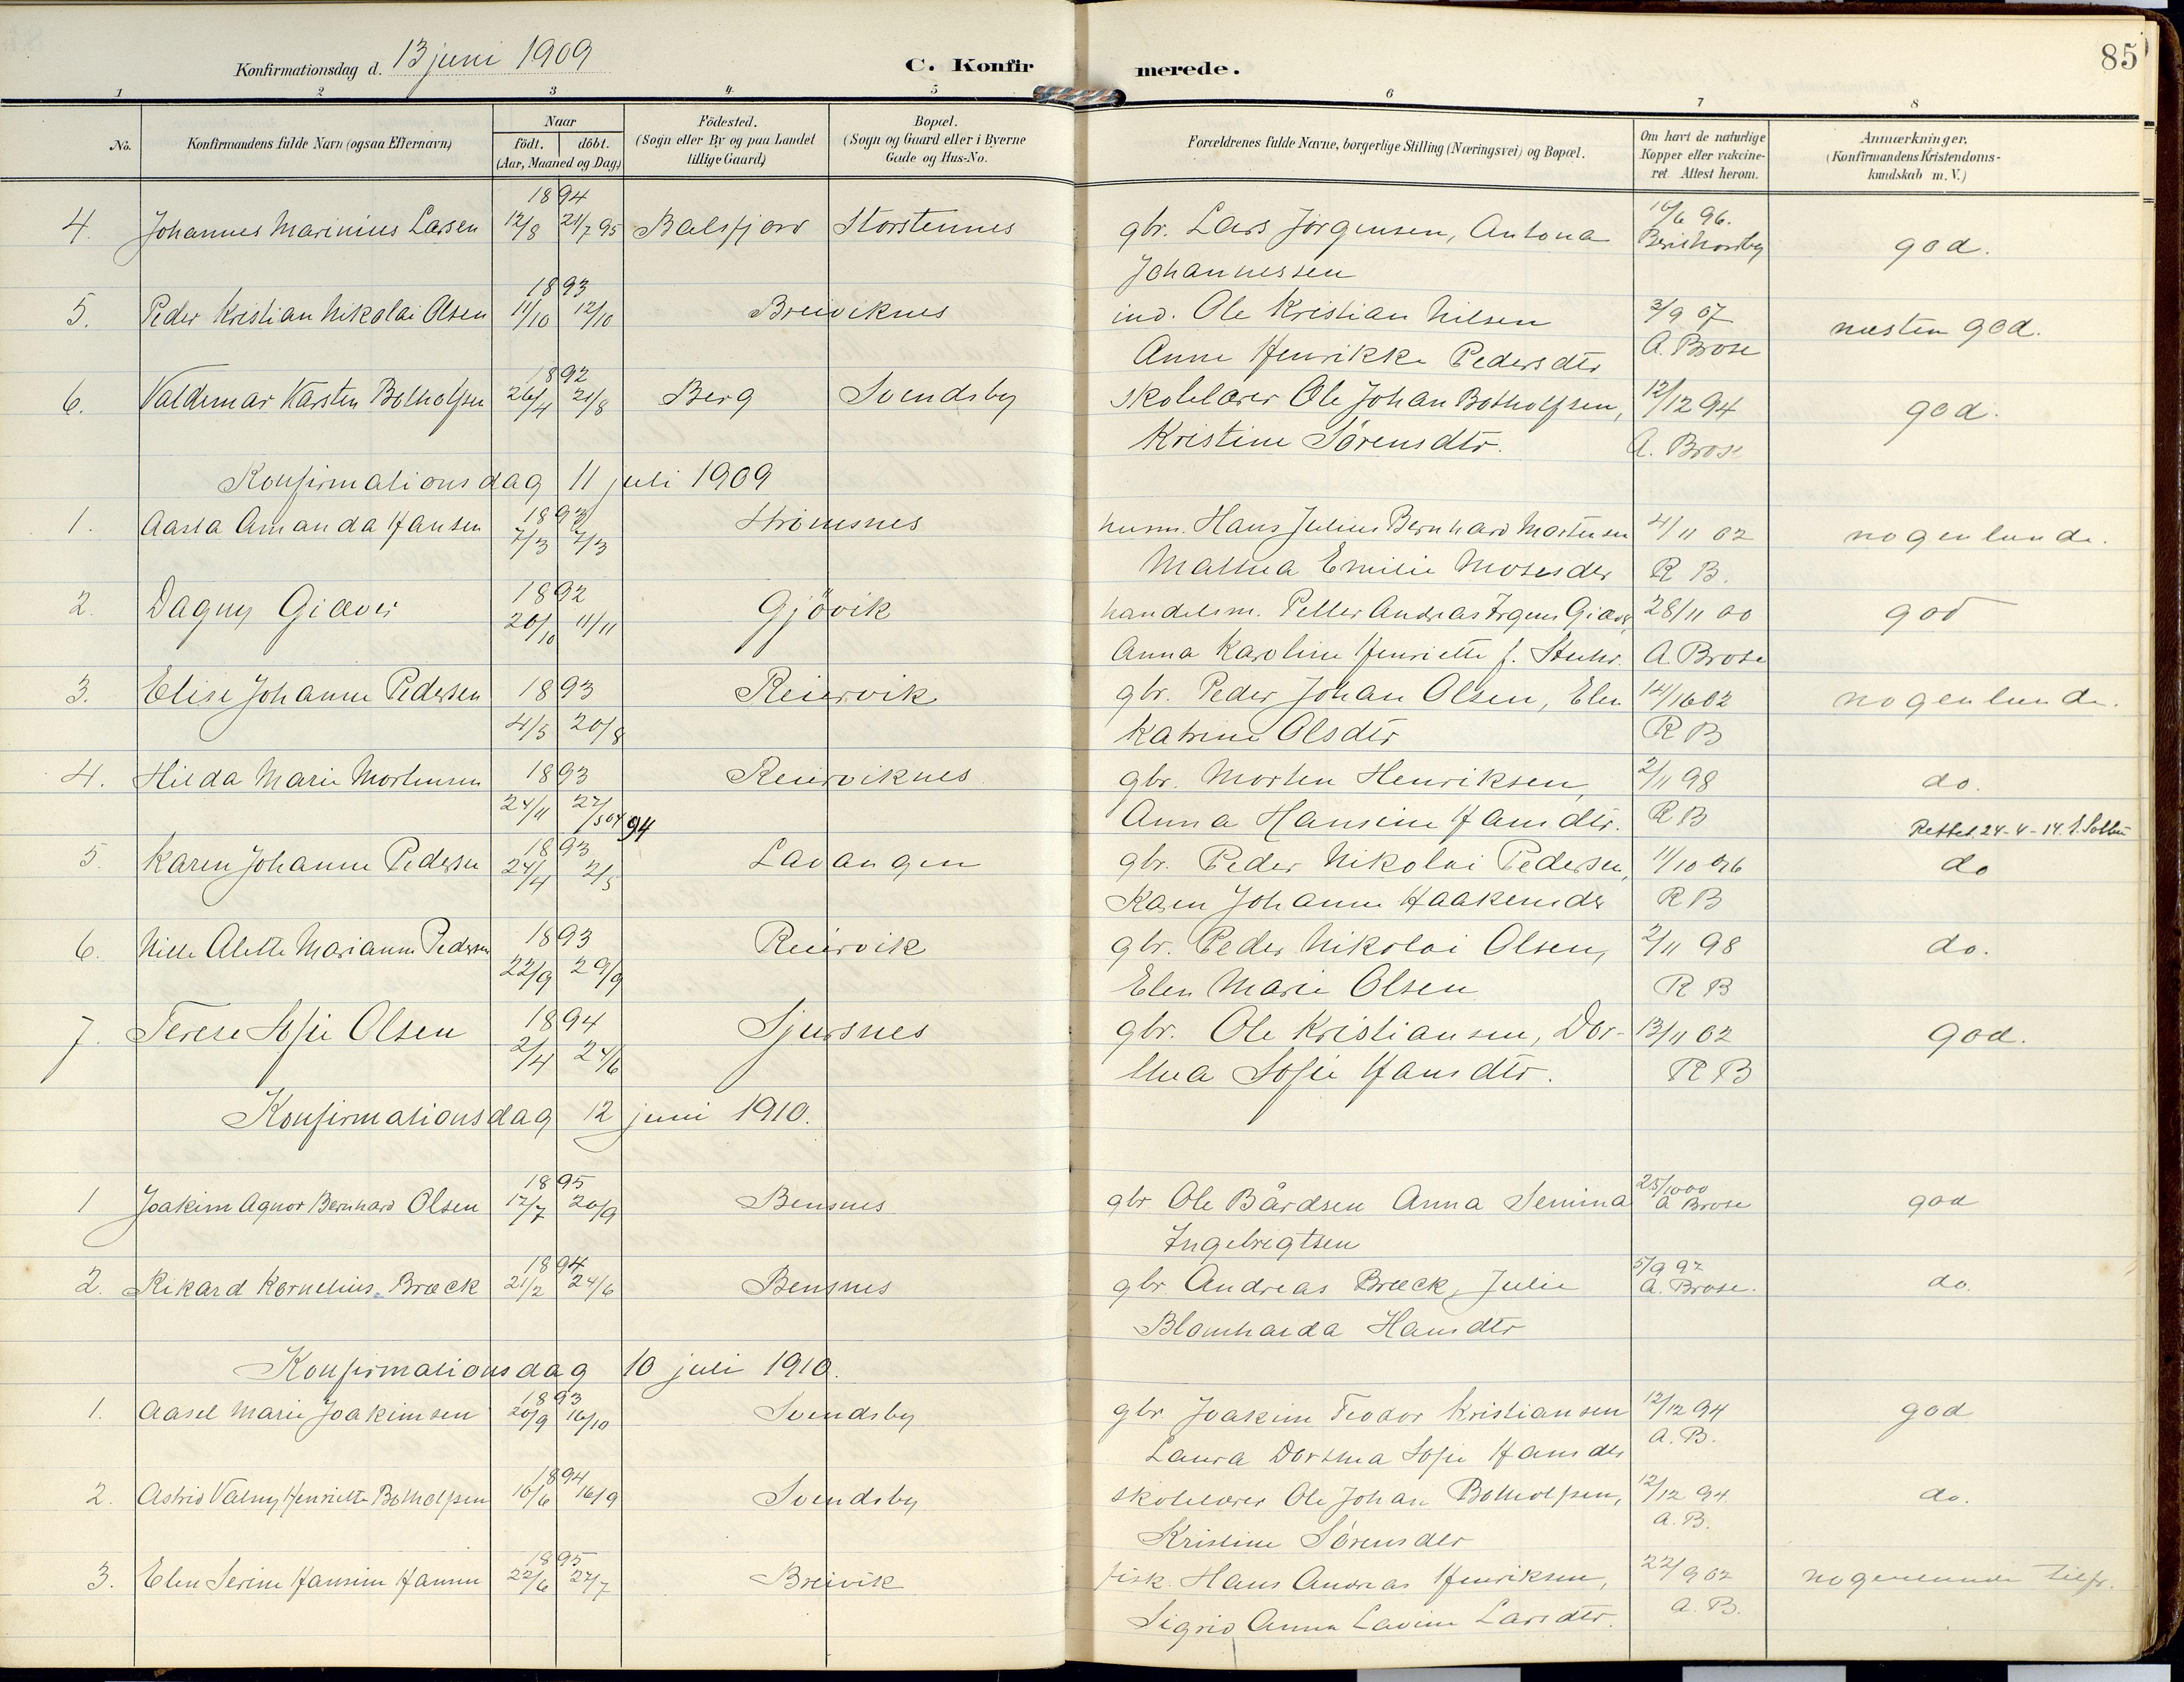 SATØ, Lyngen sokneprestembete, Ministerialbok nr. 14, 1905-1920, s. 85